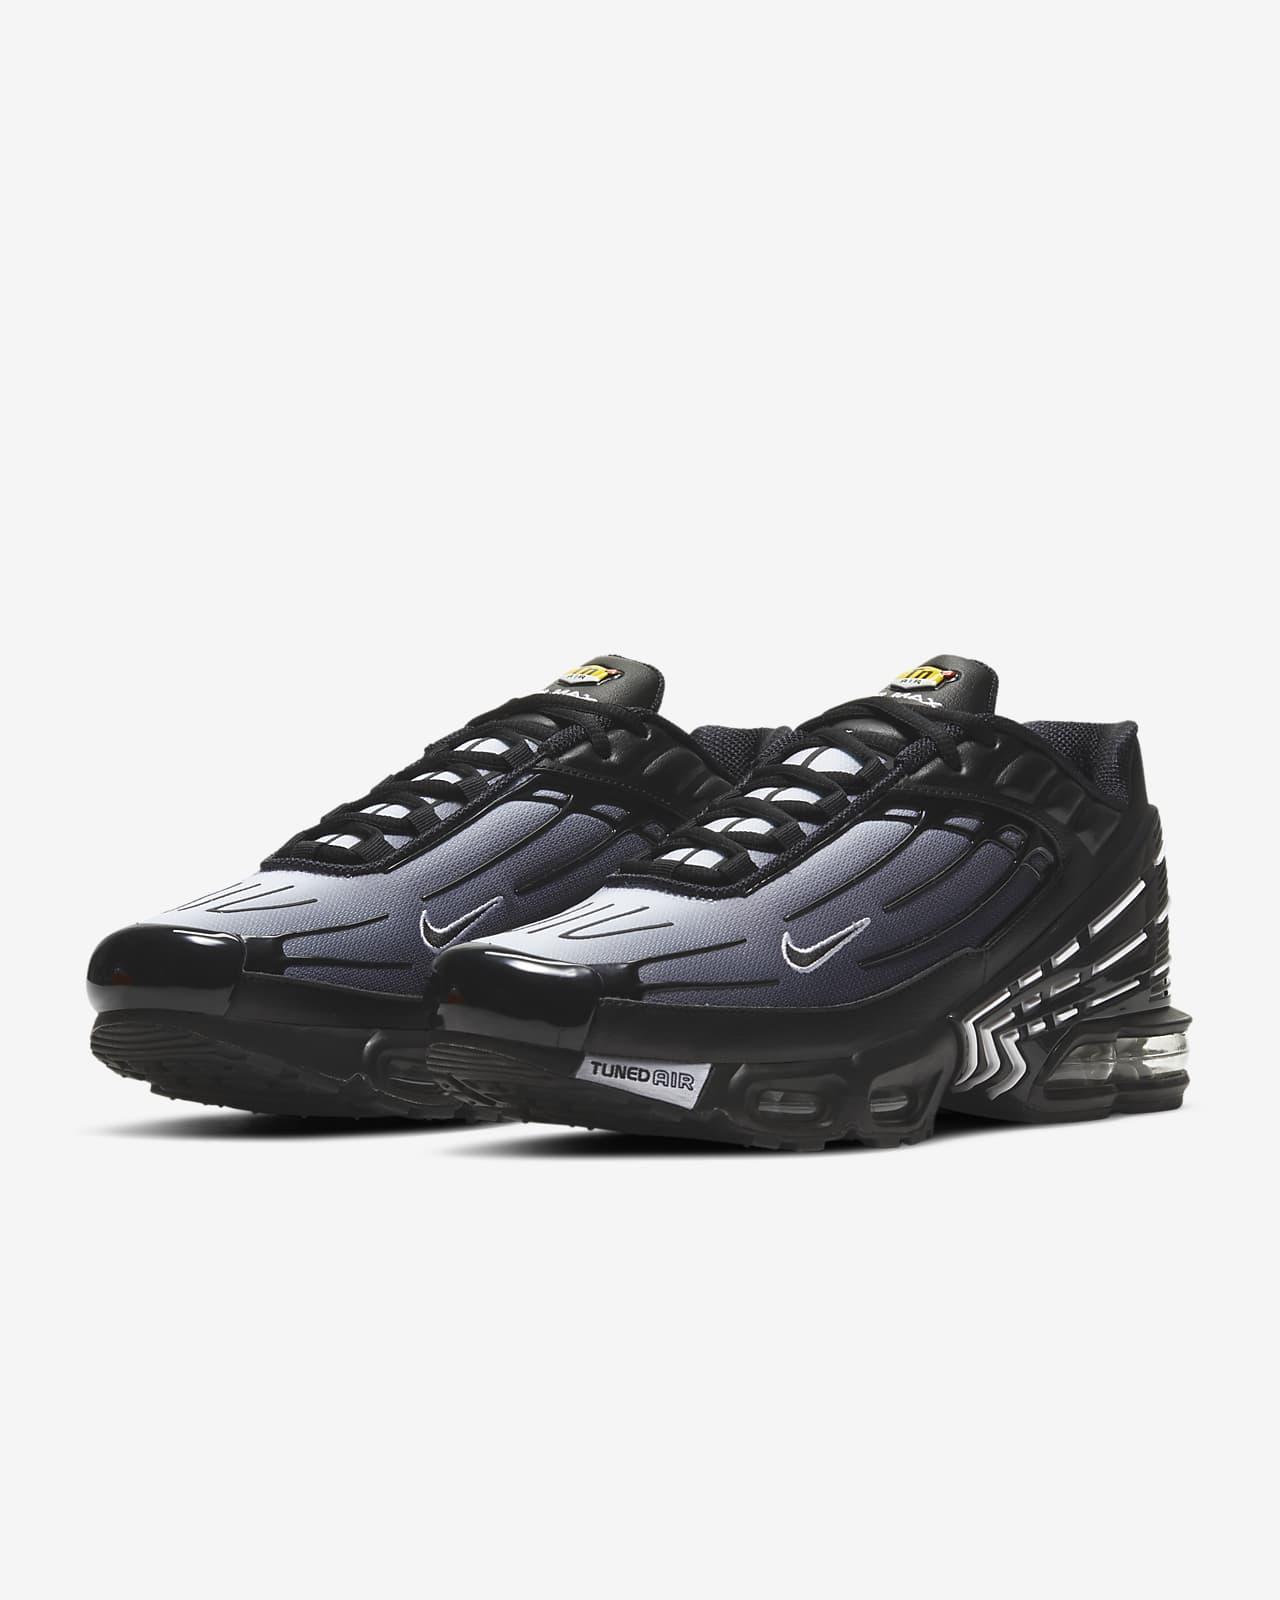 Nike Air Max Plus III Men's Shoe. Nike LU